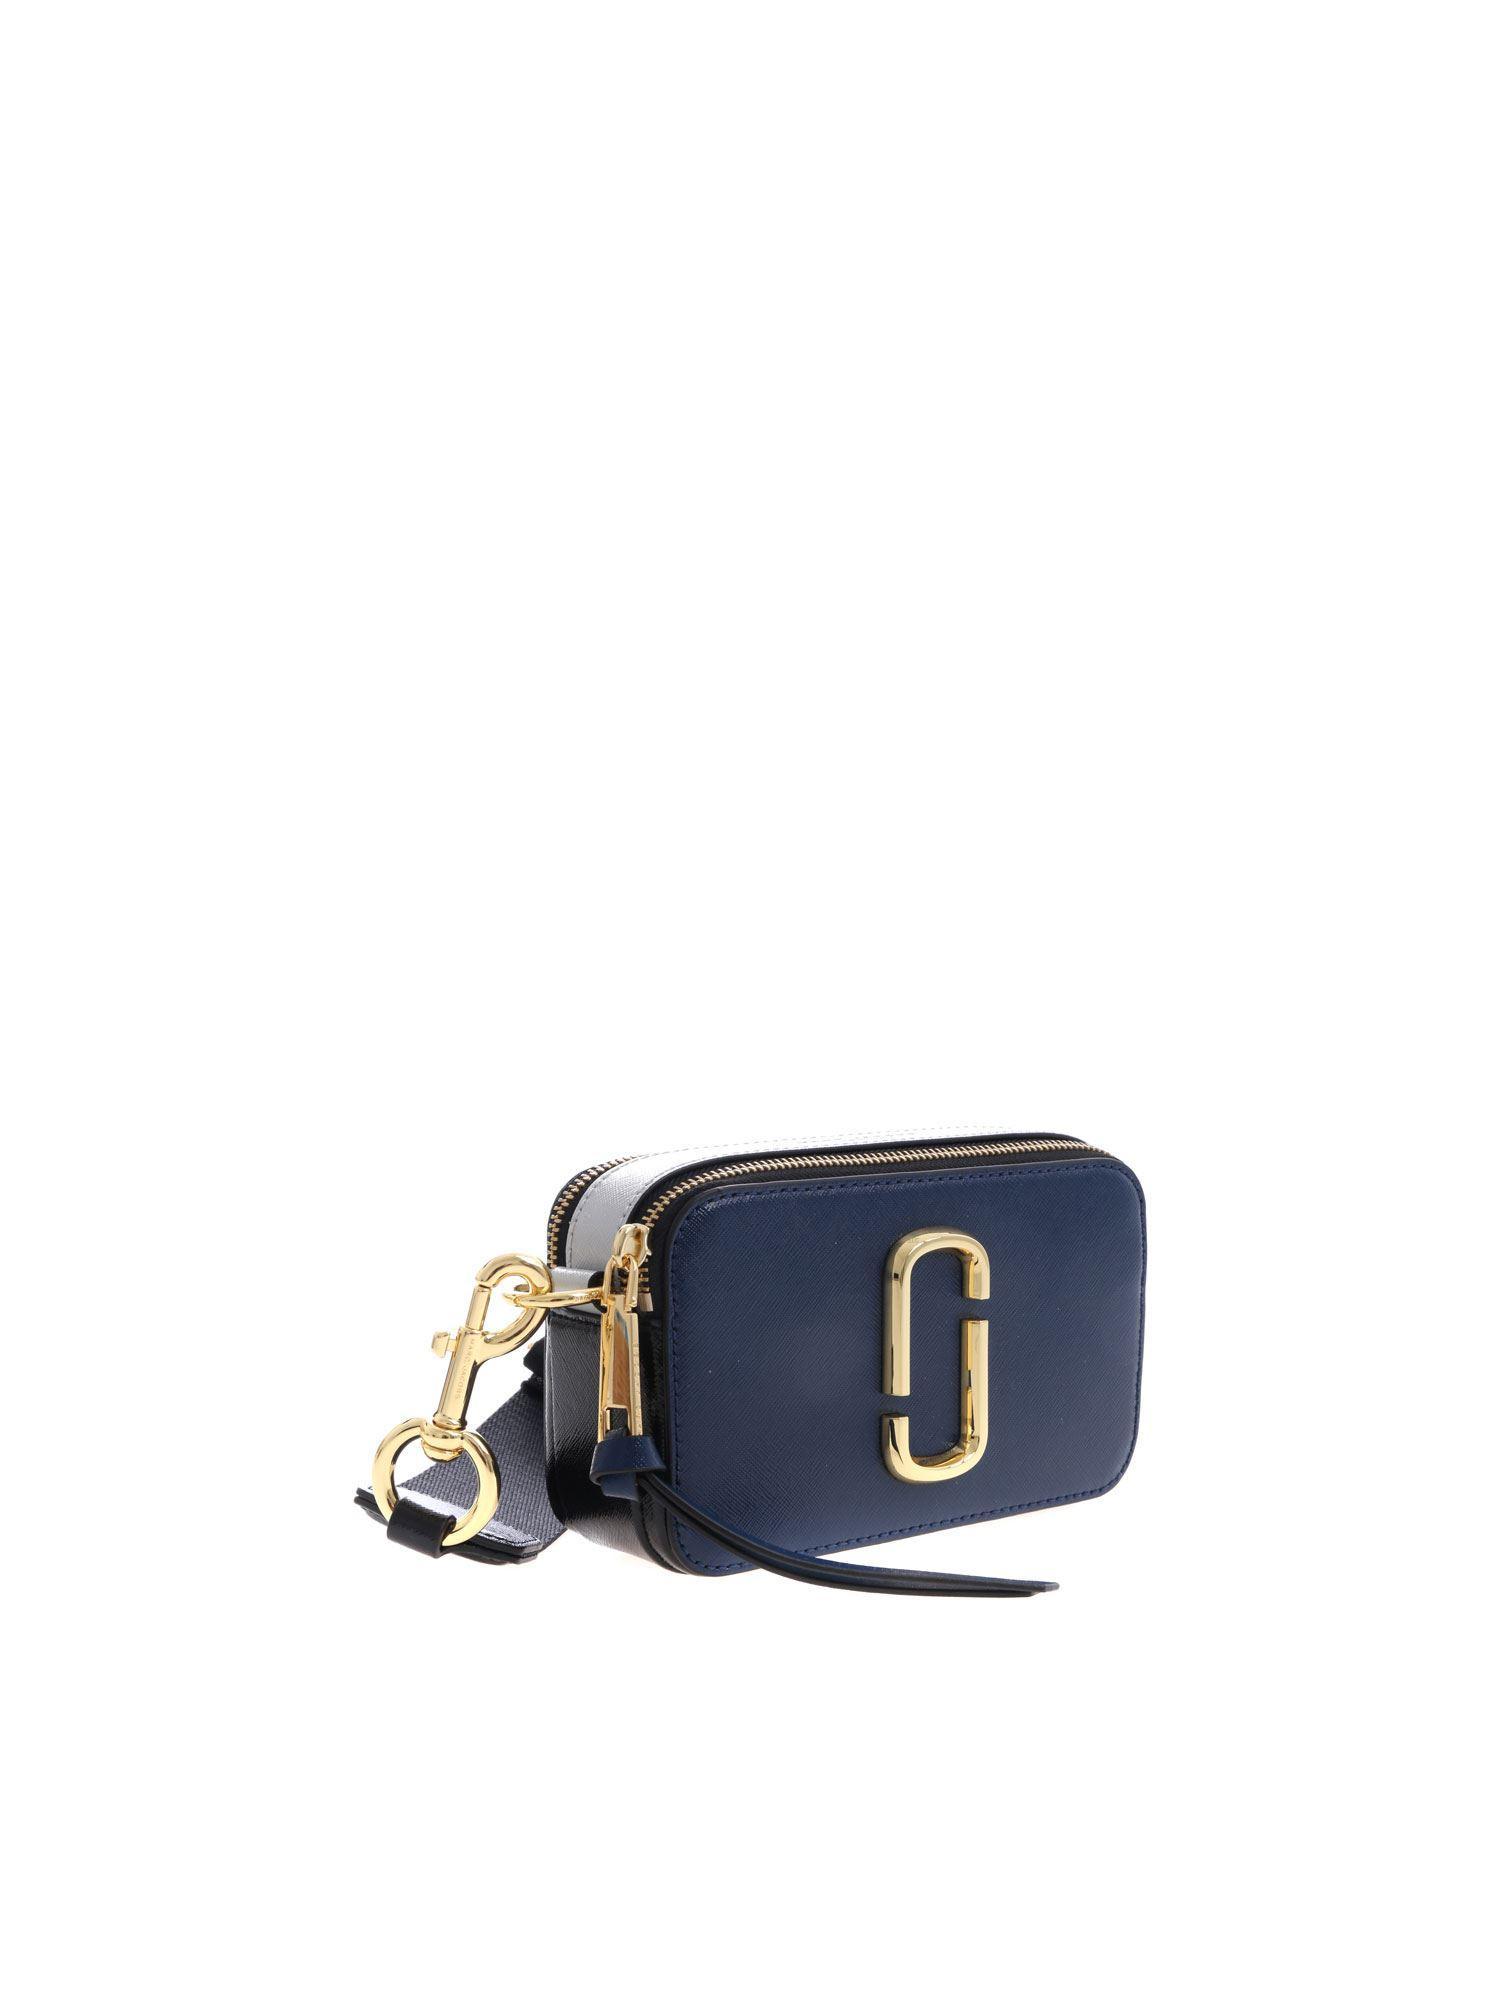 6ec9e4d9745 Lyst - Marc Jacobs Snapshot Bag Night Blue in Blue